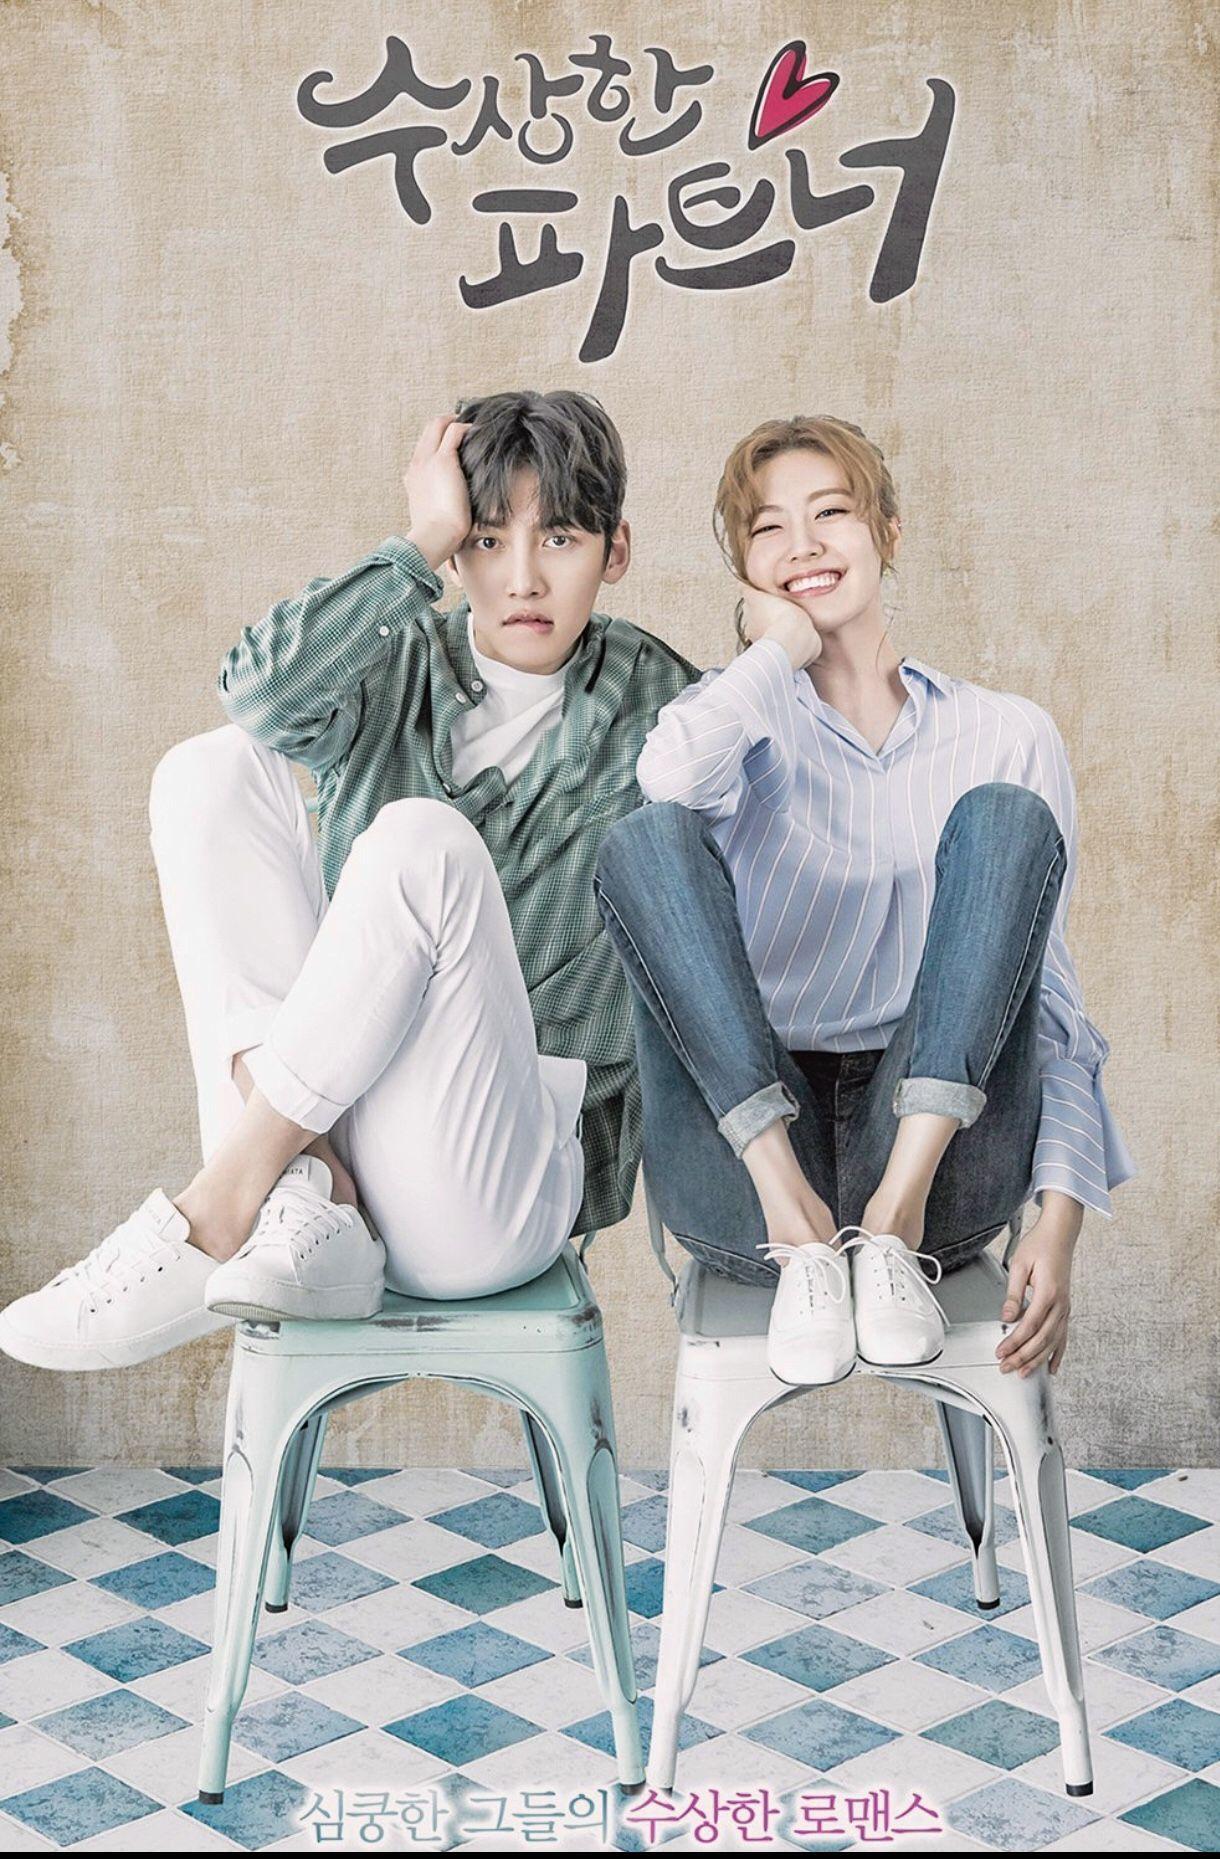 Socio Sospechoso Dorama Drama Dramas Coreanos